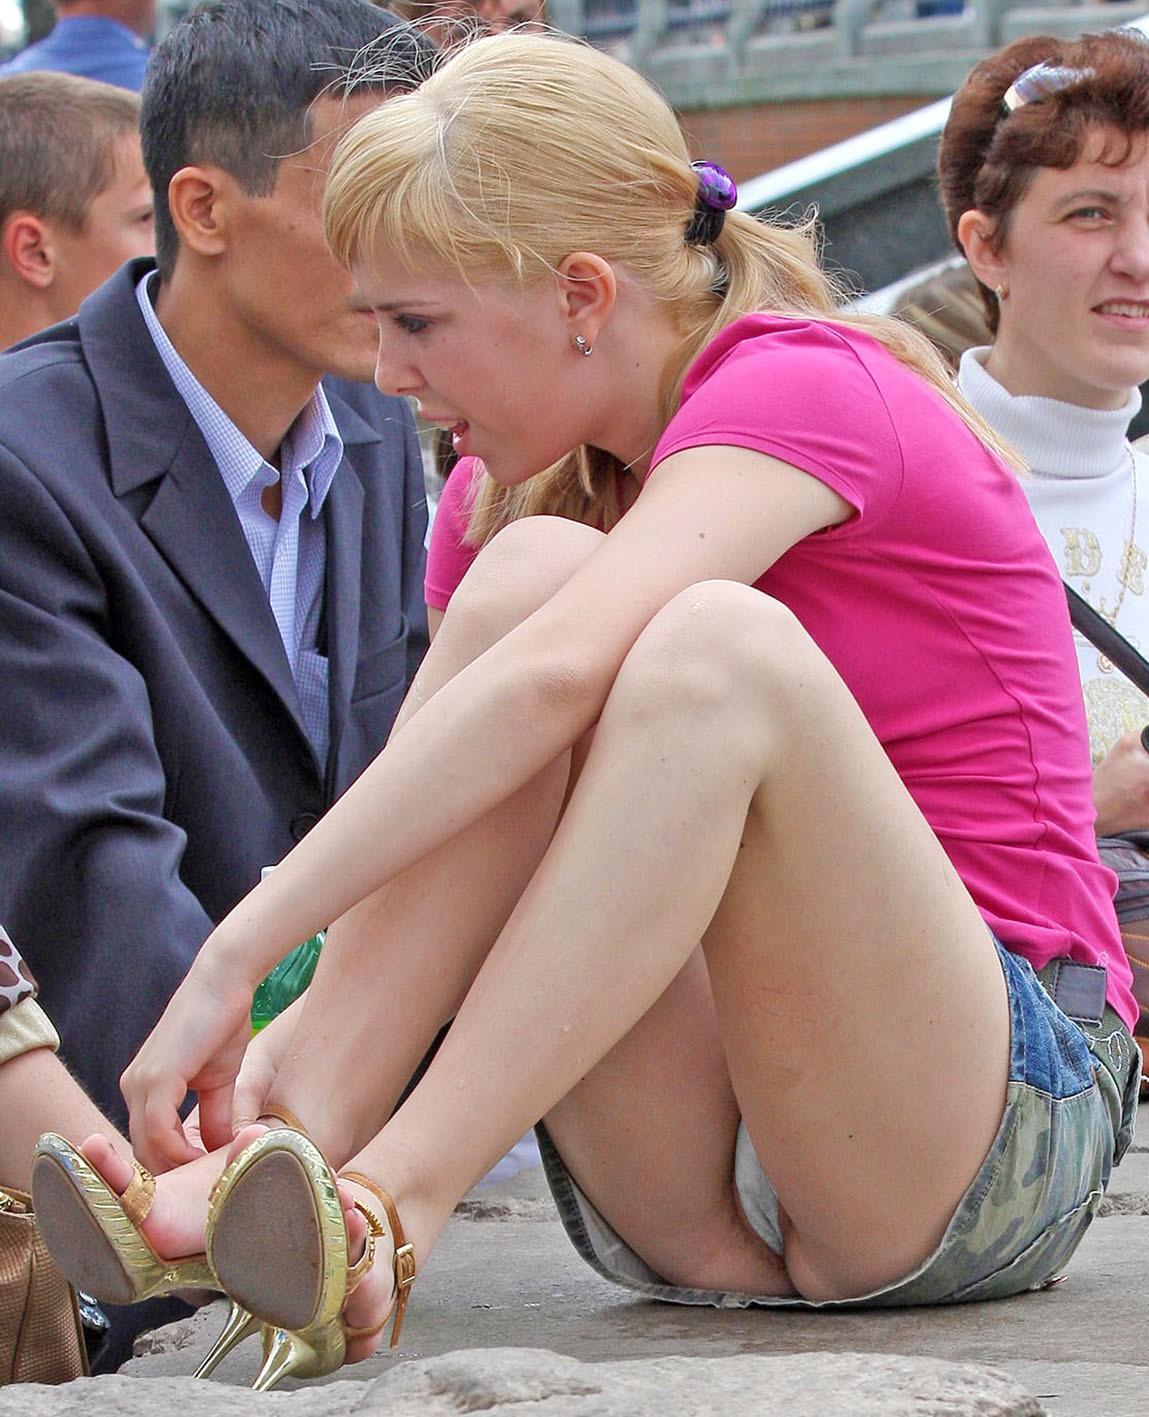 Блондинка в мини-юбке засветила киску с белыми трусиками